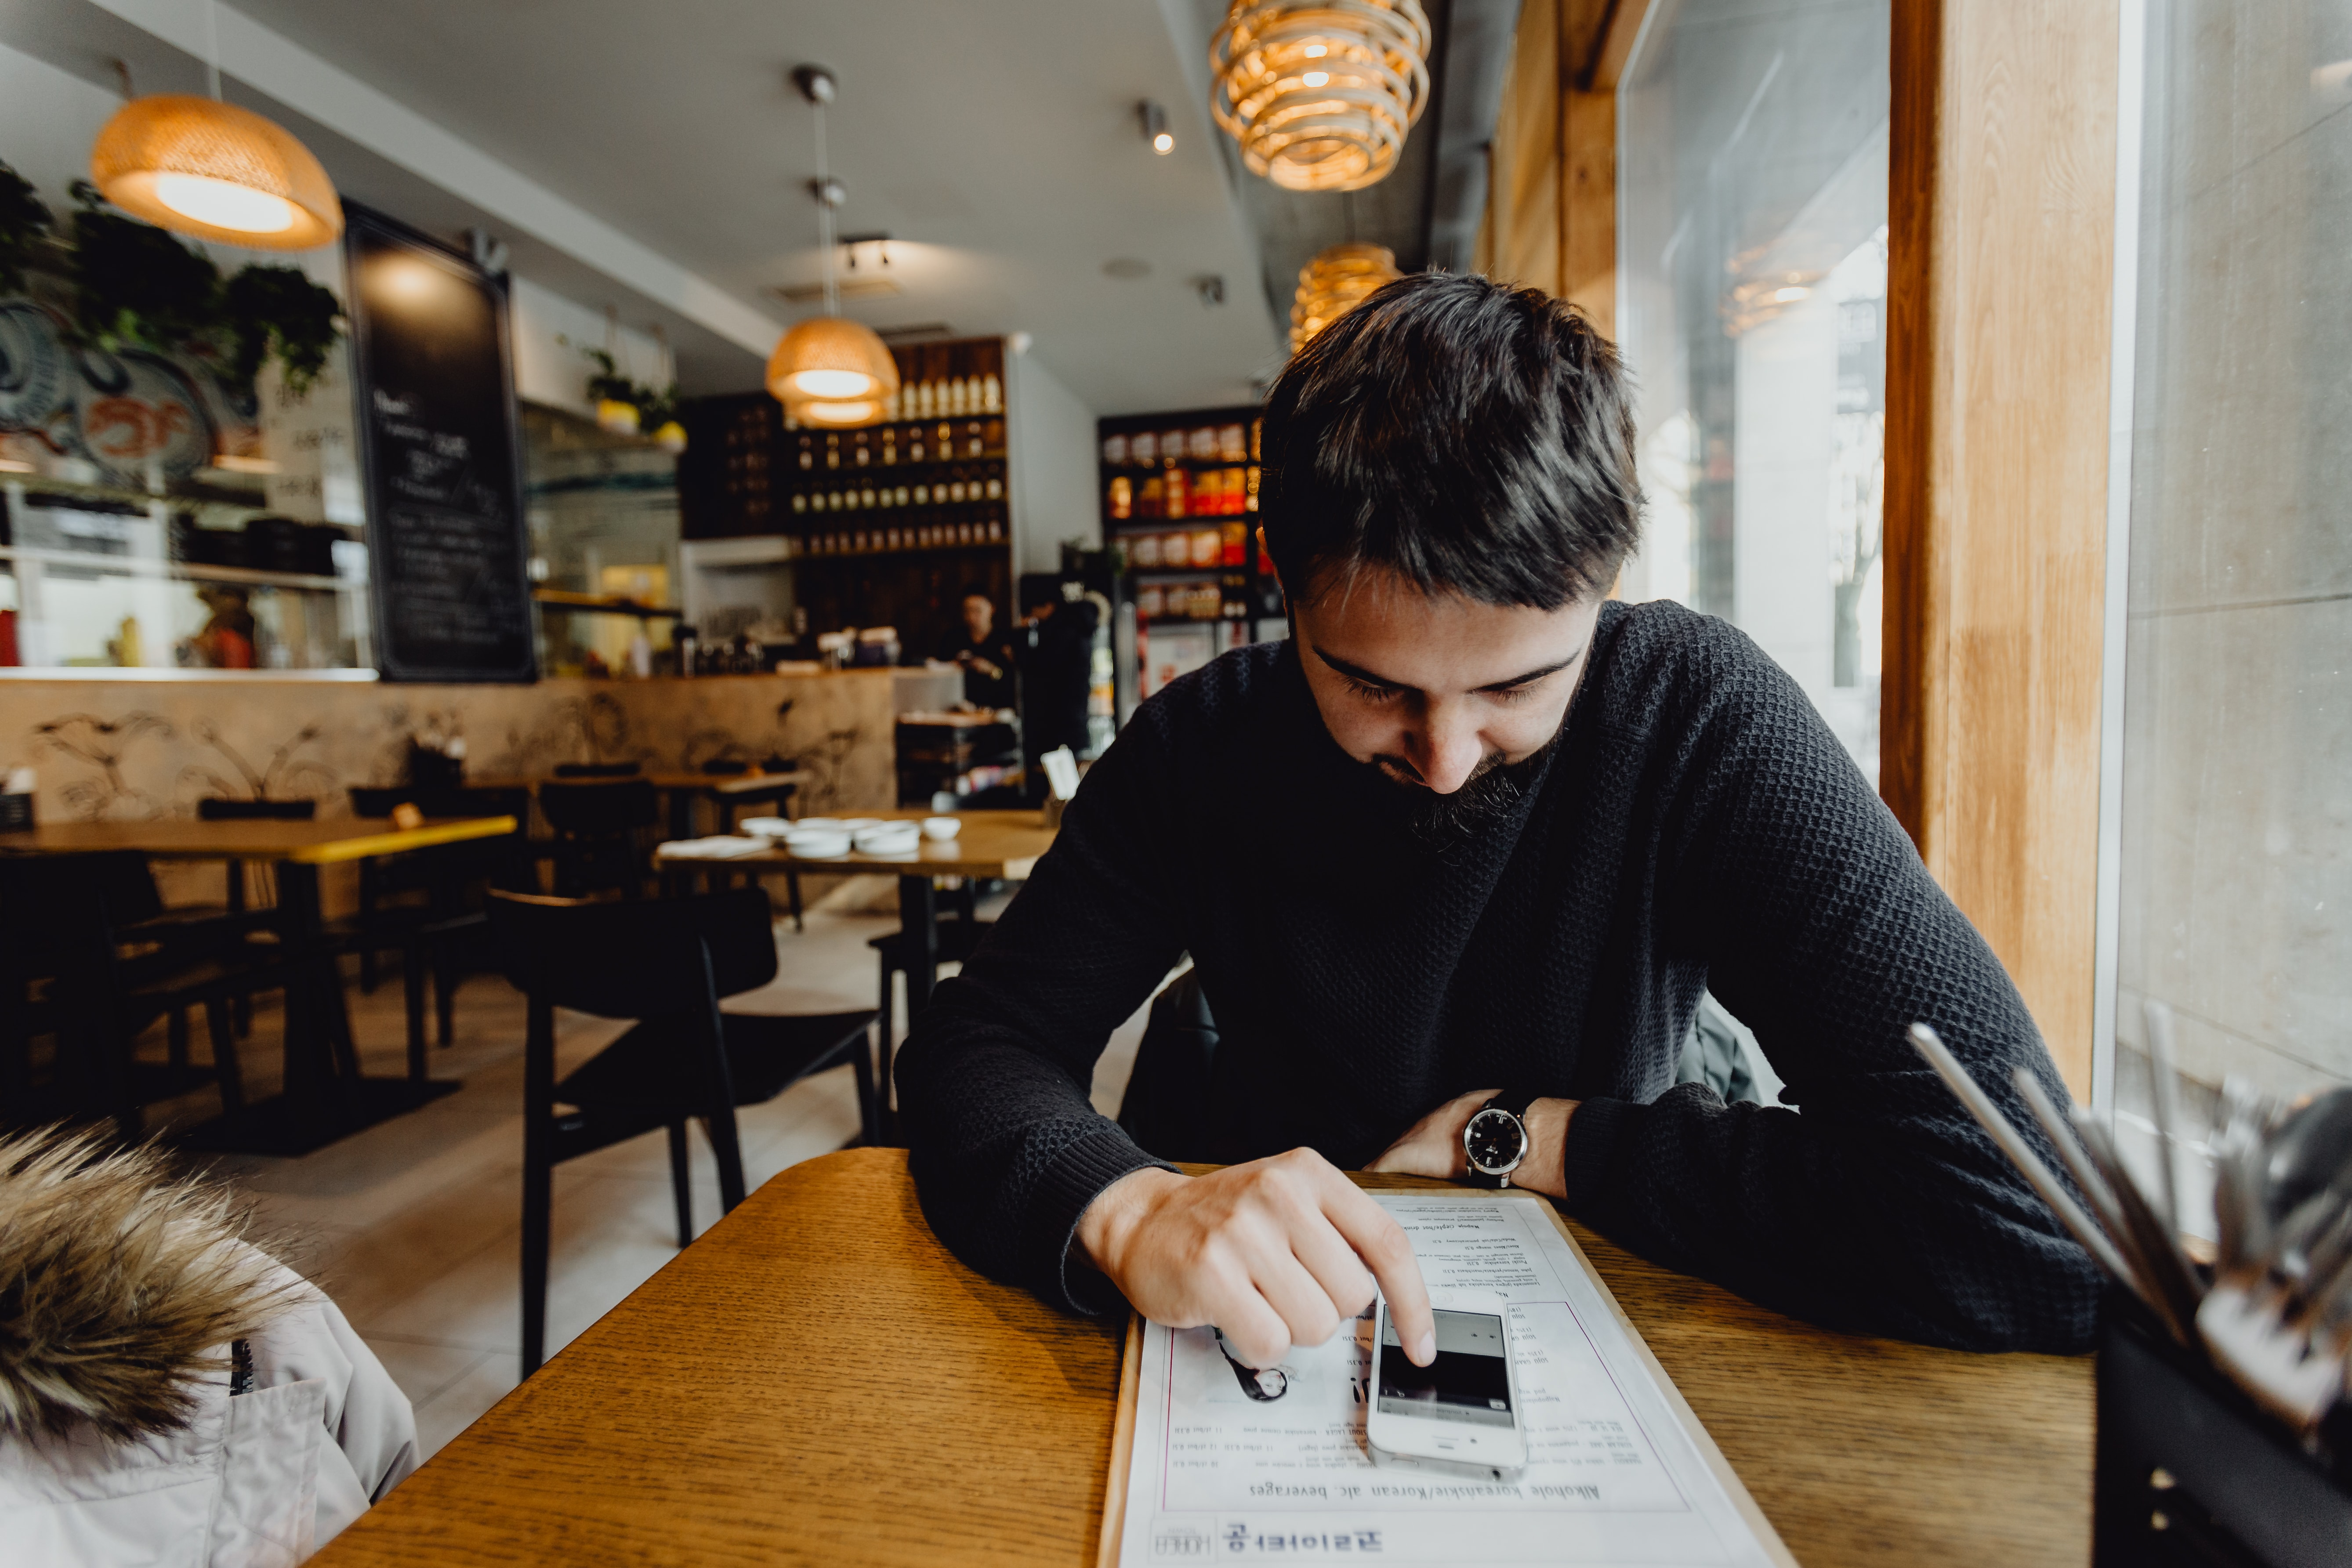 kaboompics_Man using his mobile phone in the restaurant